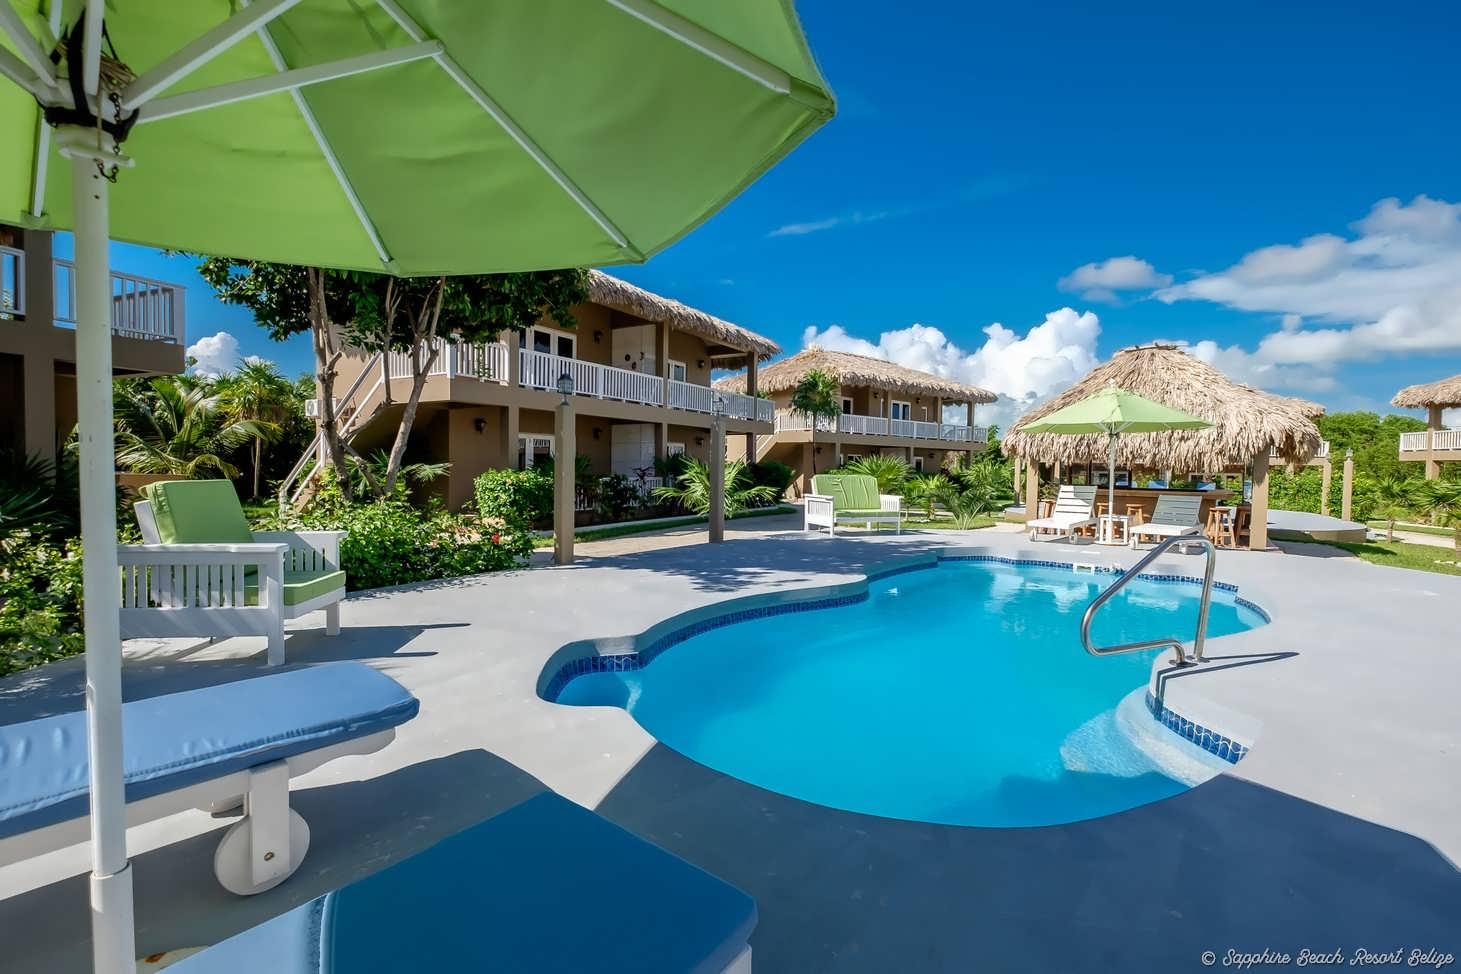 Sapphire Beach Resort Pools 26.jpg